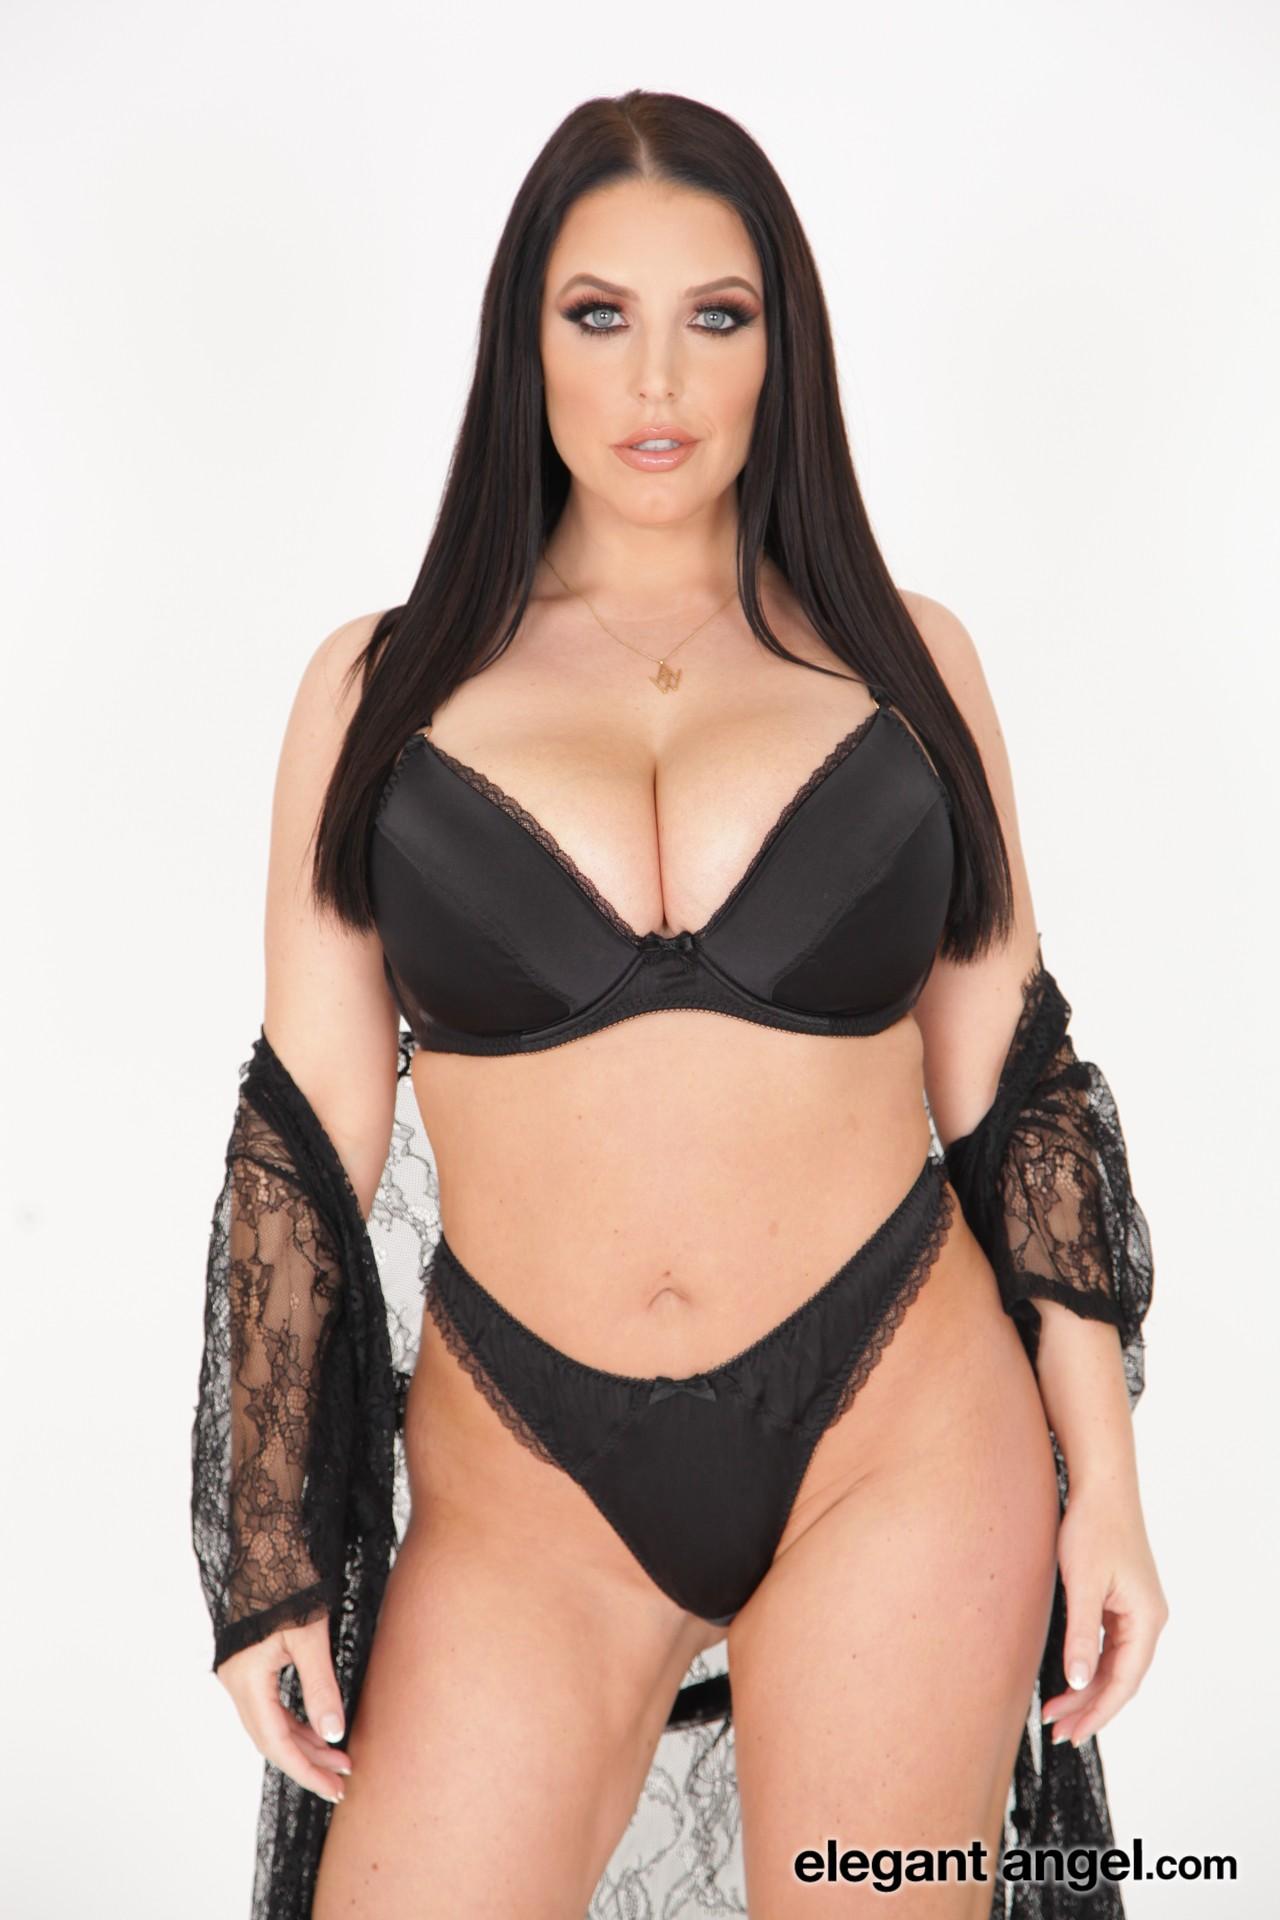 Karma Rx Angela White Alina Lopez Elegant Angel Performer Year 2020 01